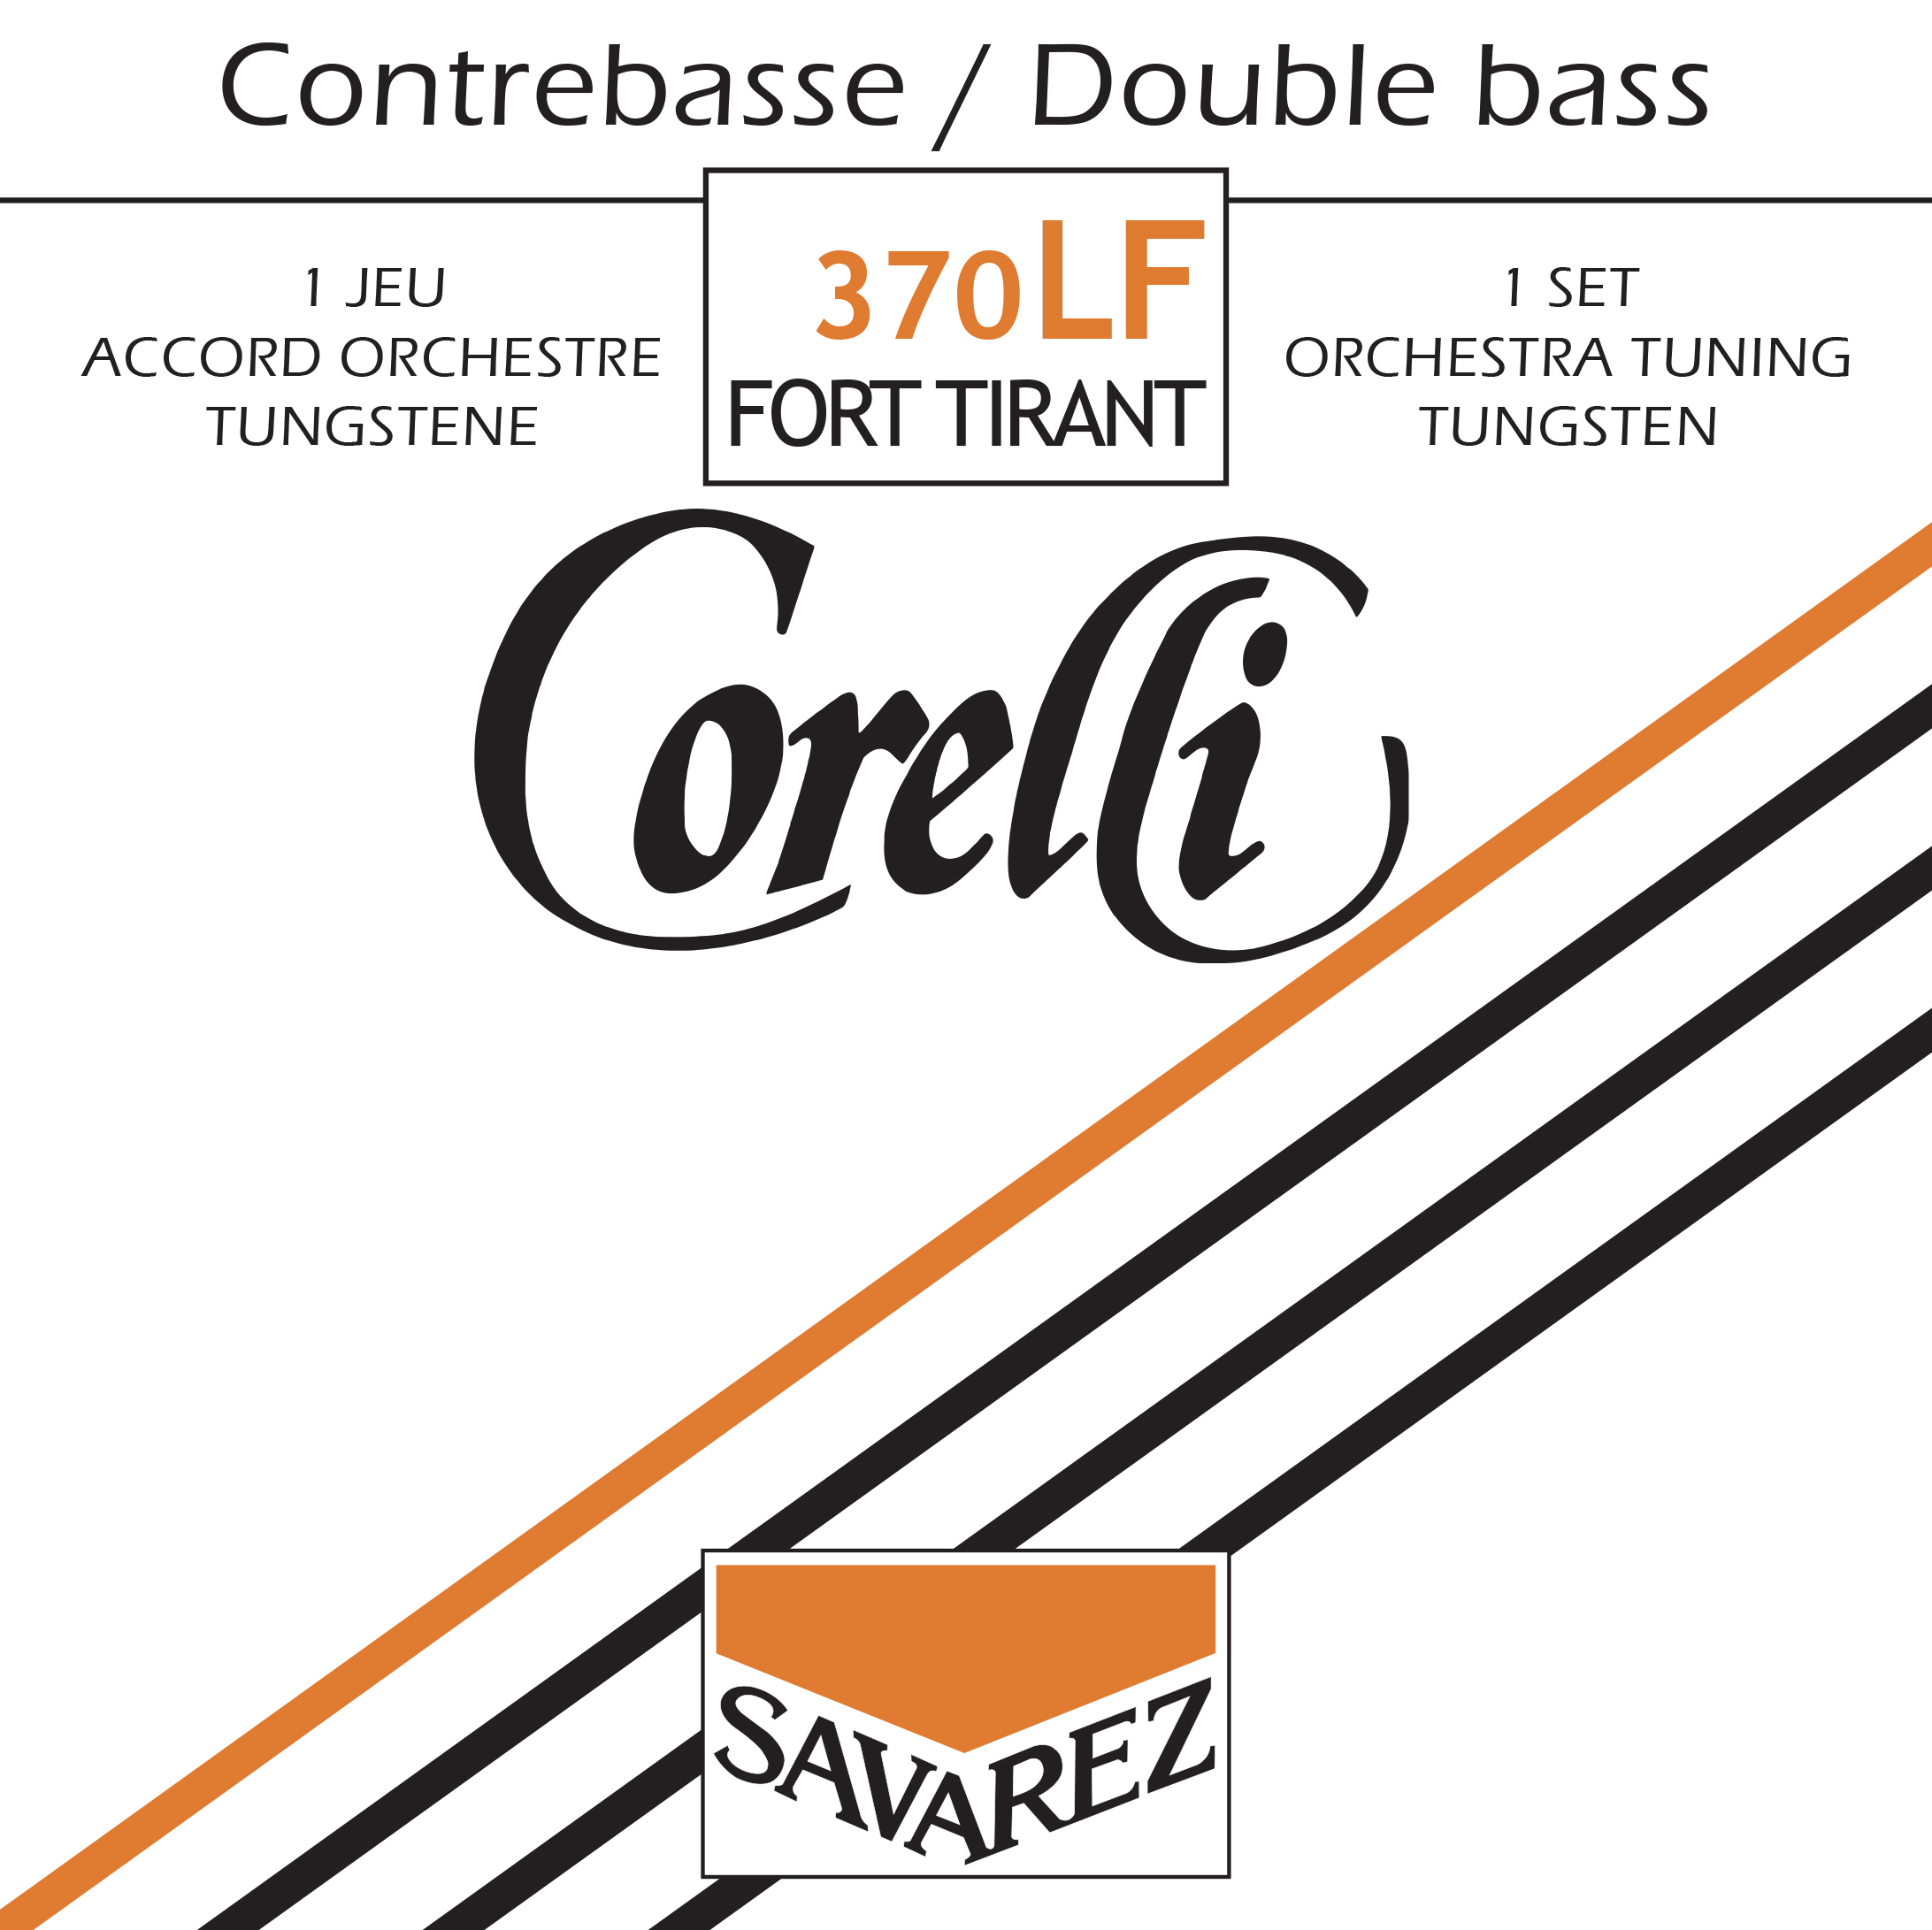 CORELLI FORT TIRANT 370LF